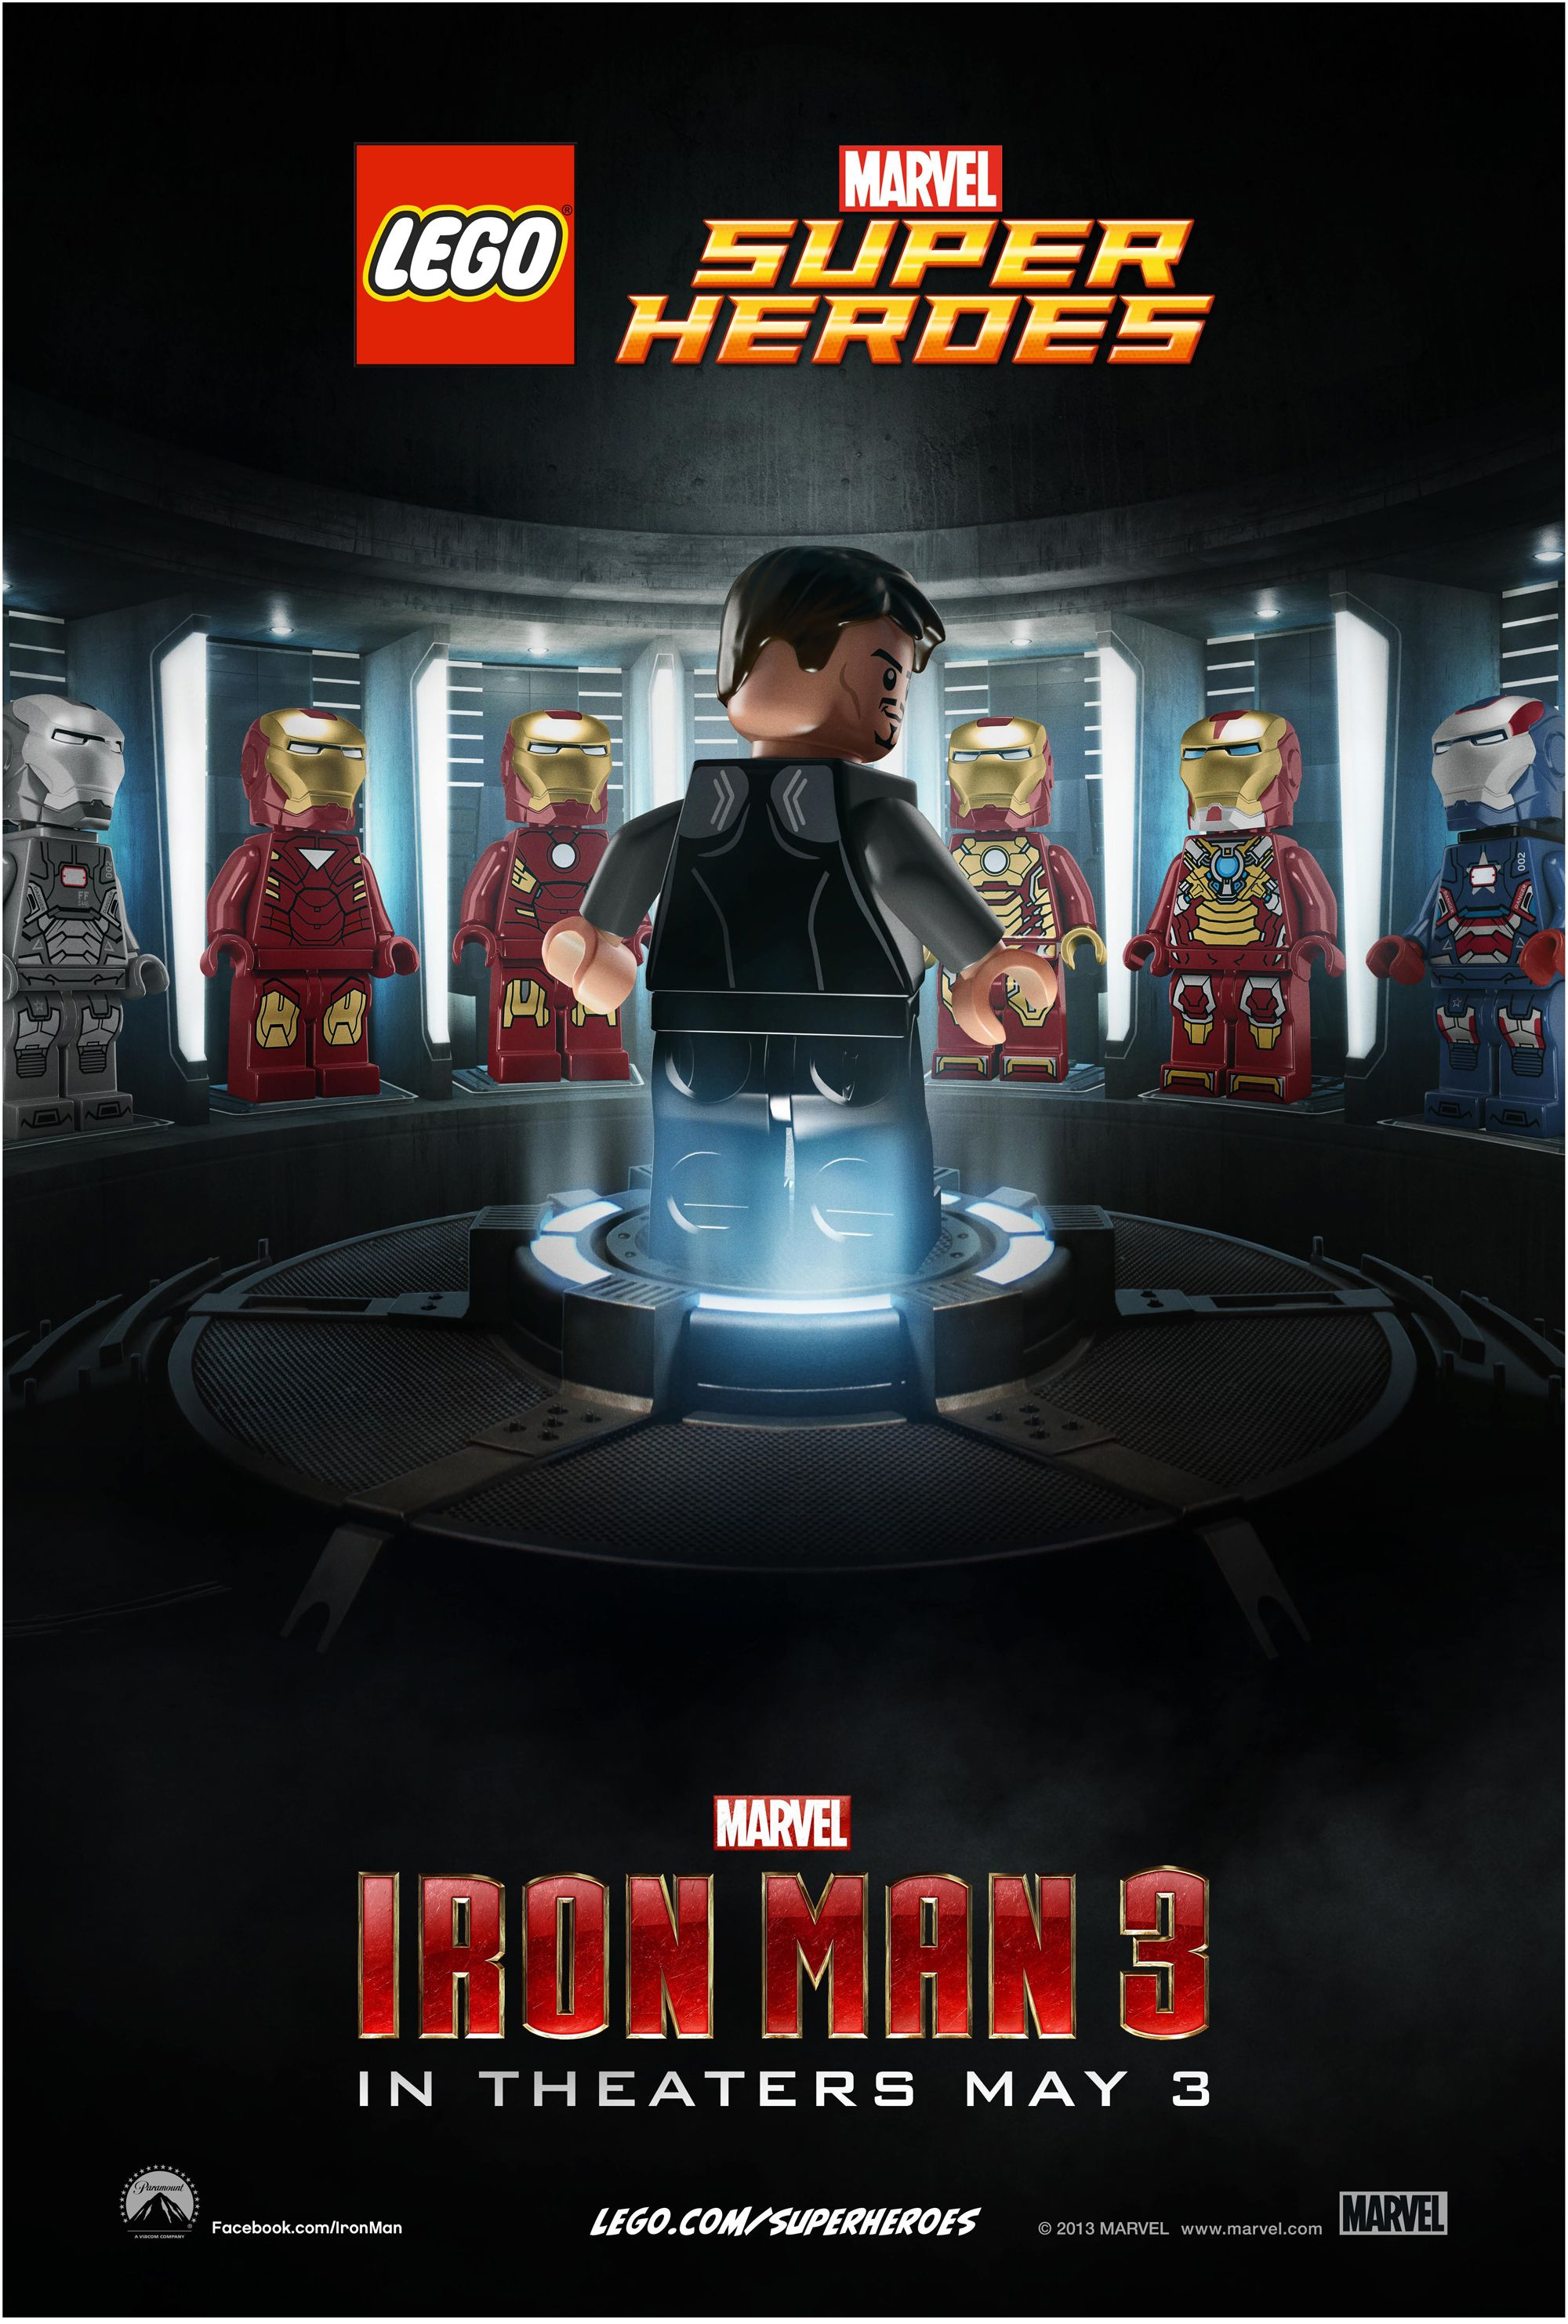 IRON MAN 3 LEGO Posters. IRON MAN 3 Stars Robert Downey Jr. | Collider